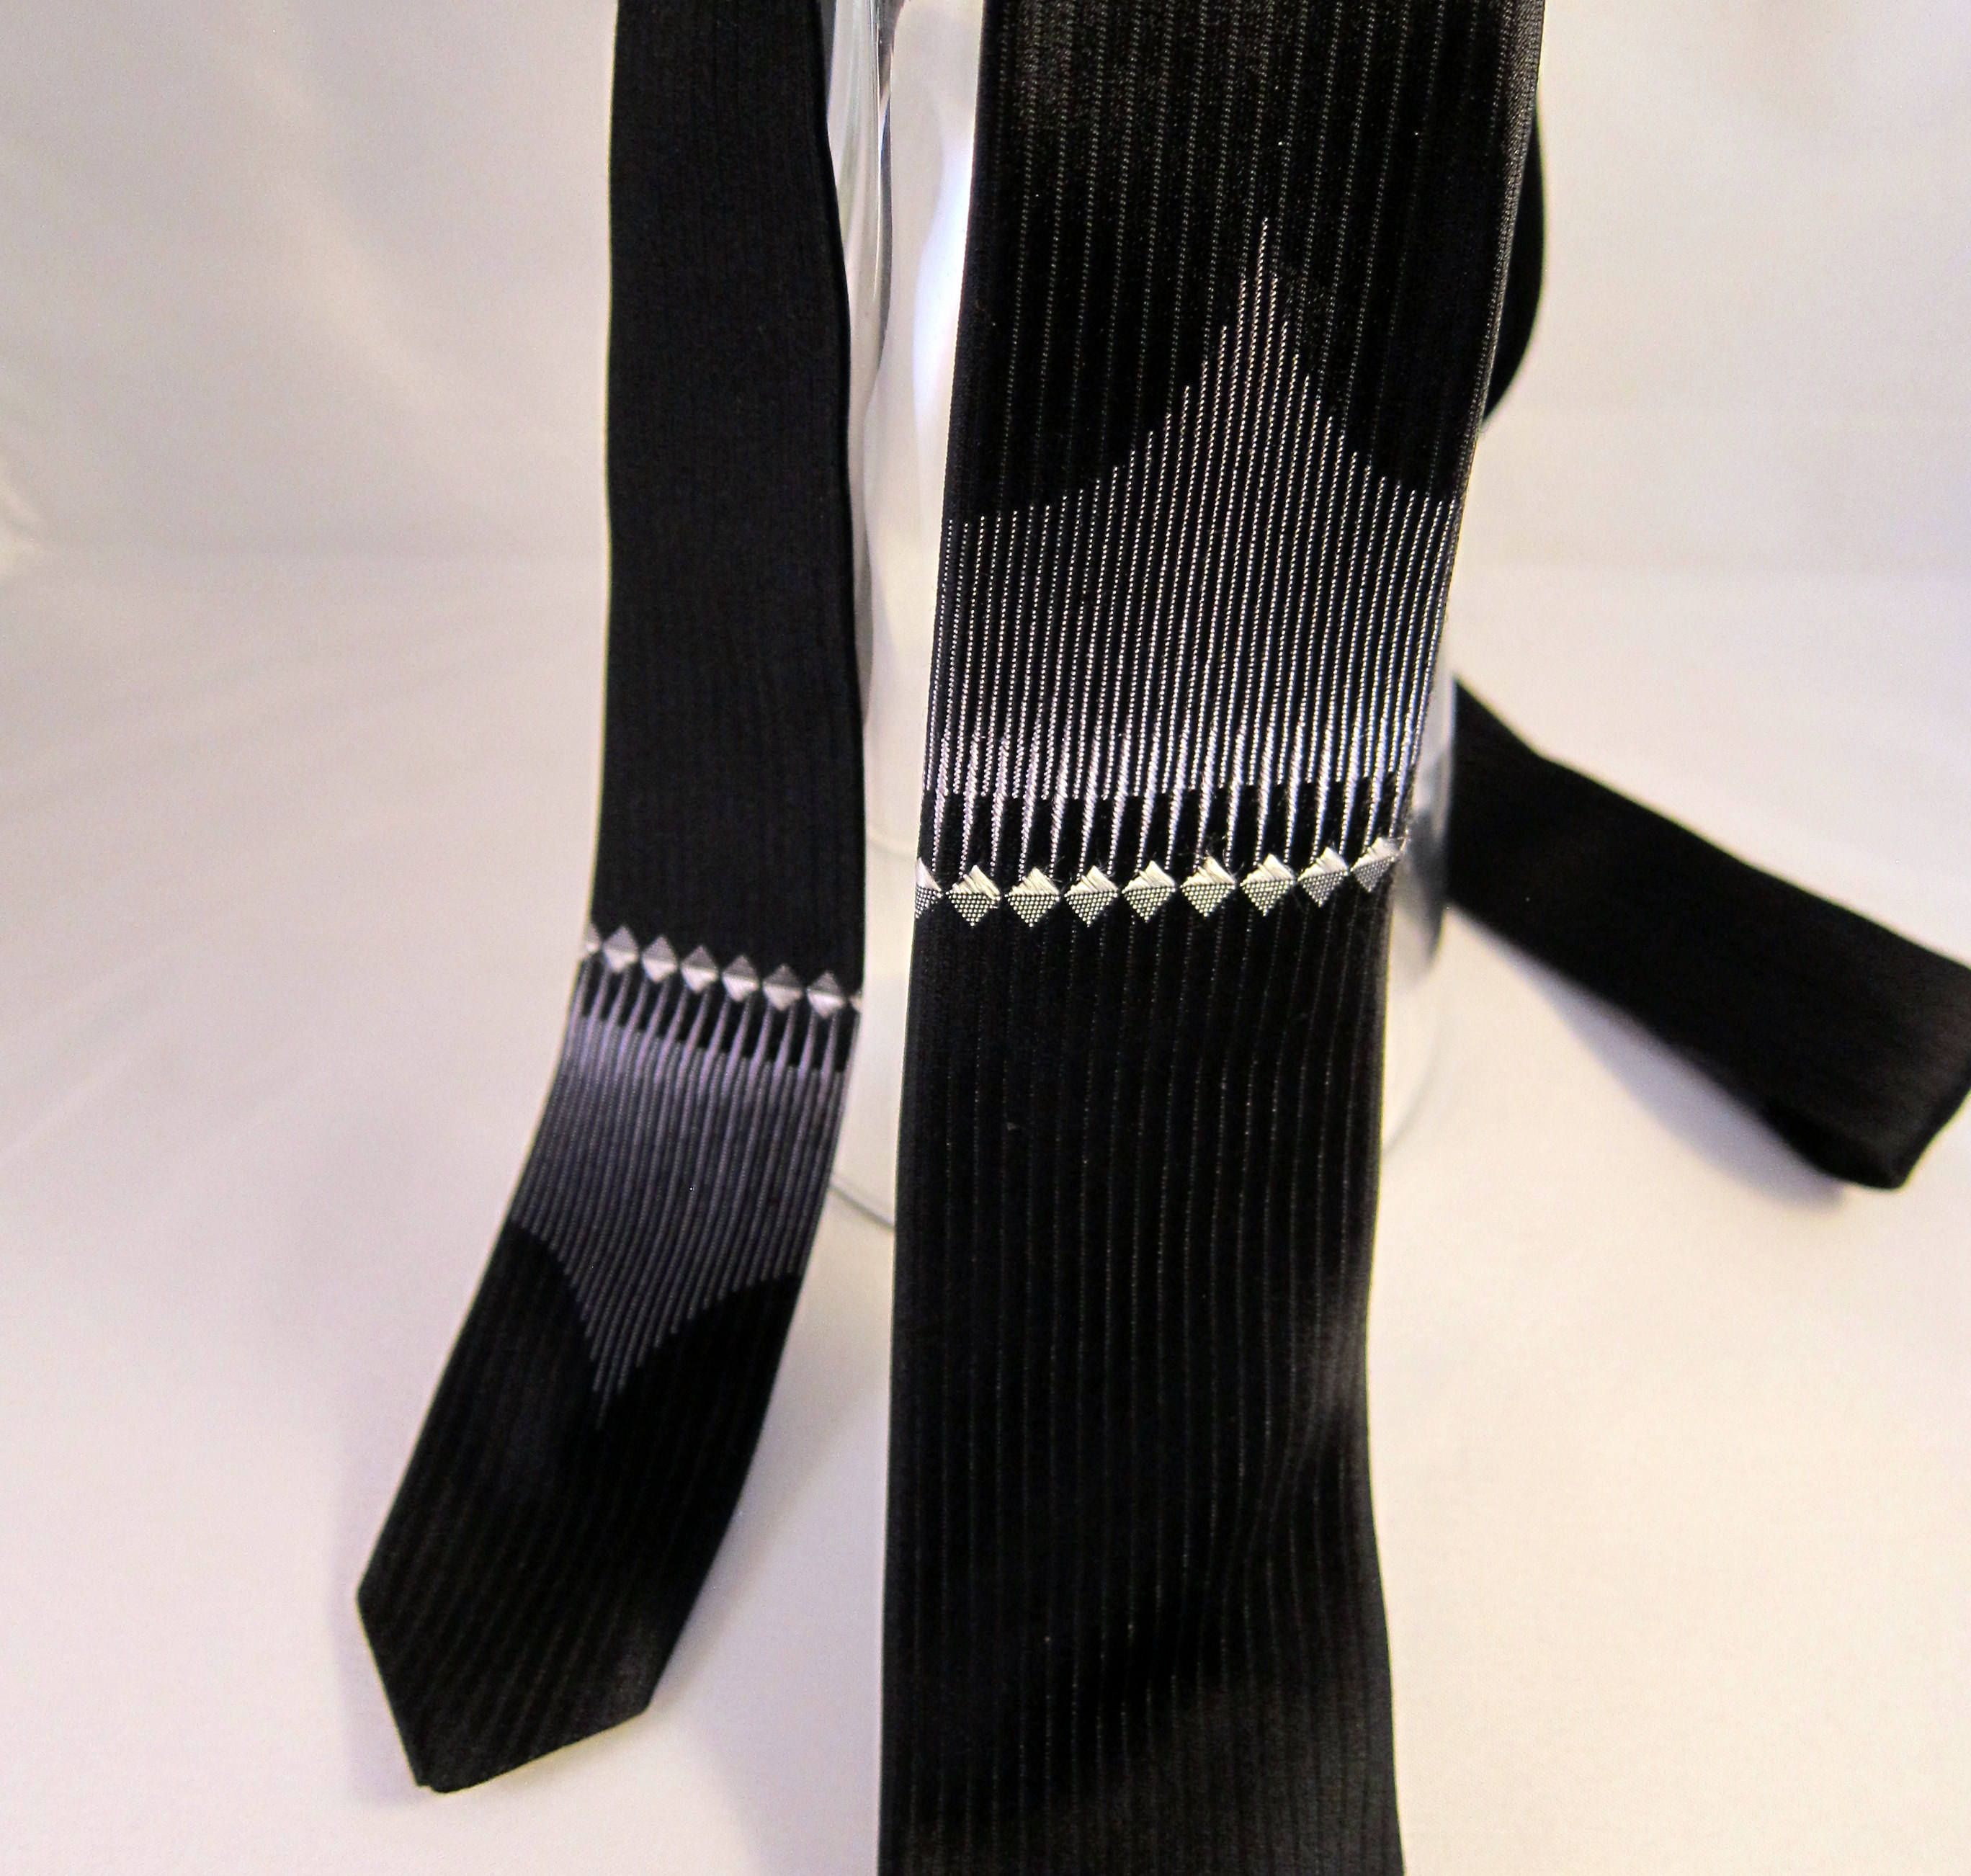 1960s Vintage Slim Tie  Mens Tie  Slim Necktie  Mid Century Vintage  Mad Men